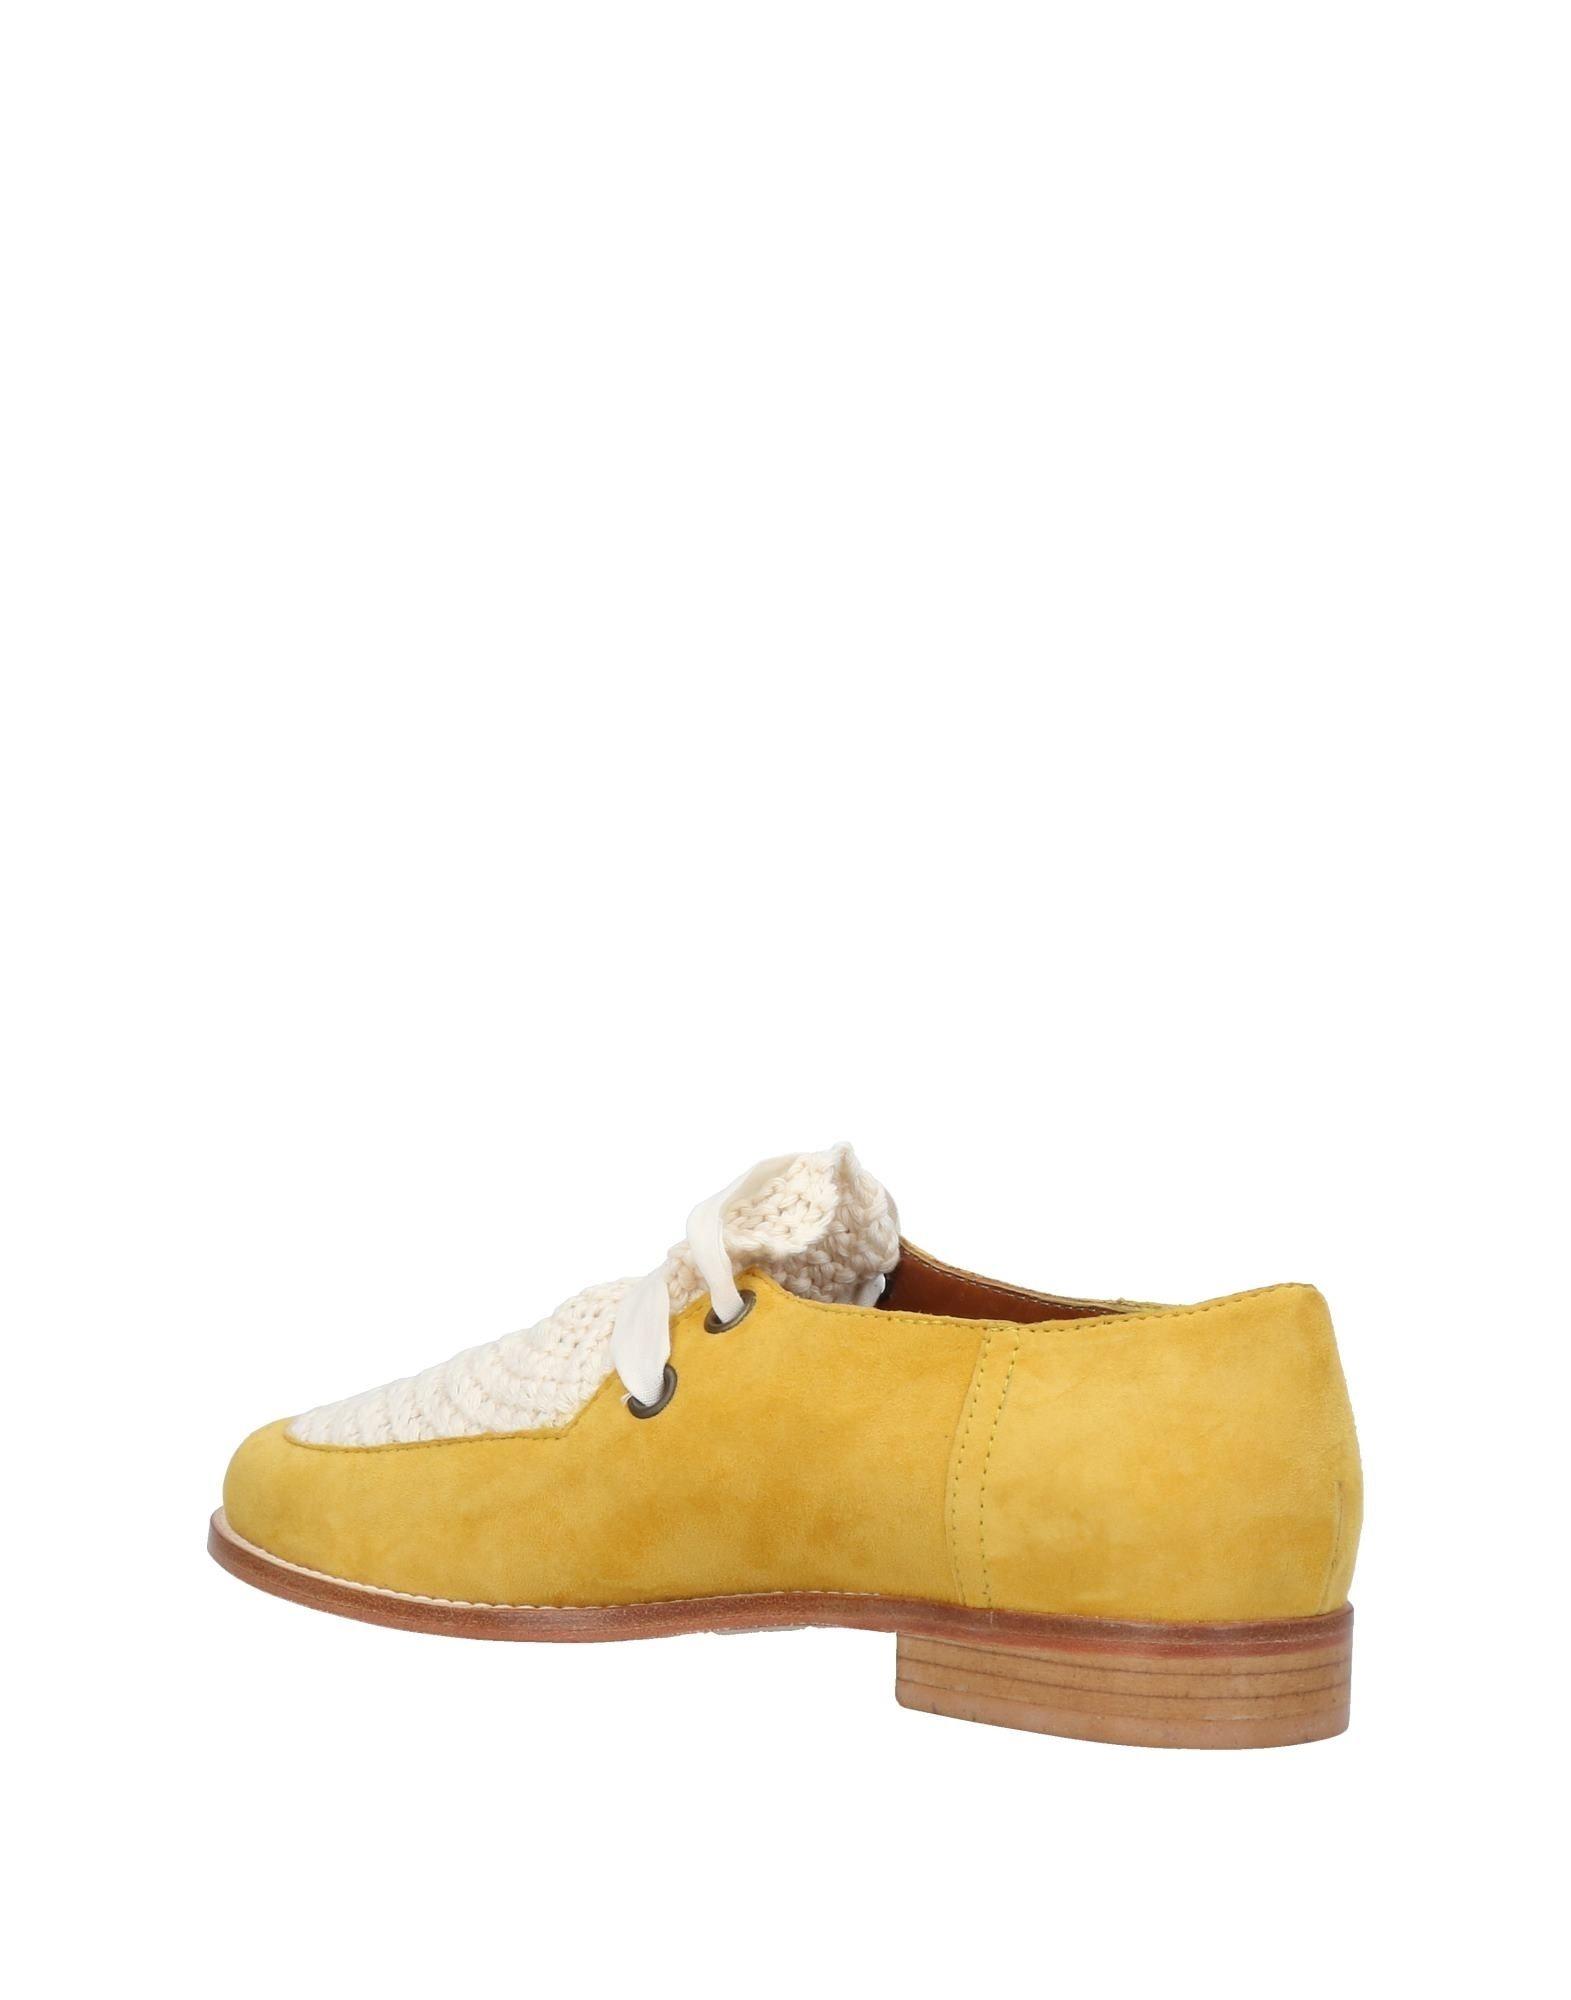 Chaussures - Tribunaux D'alessandro cFwlRQxD13